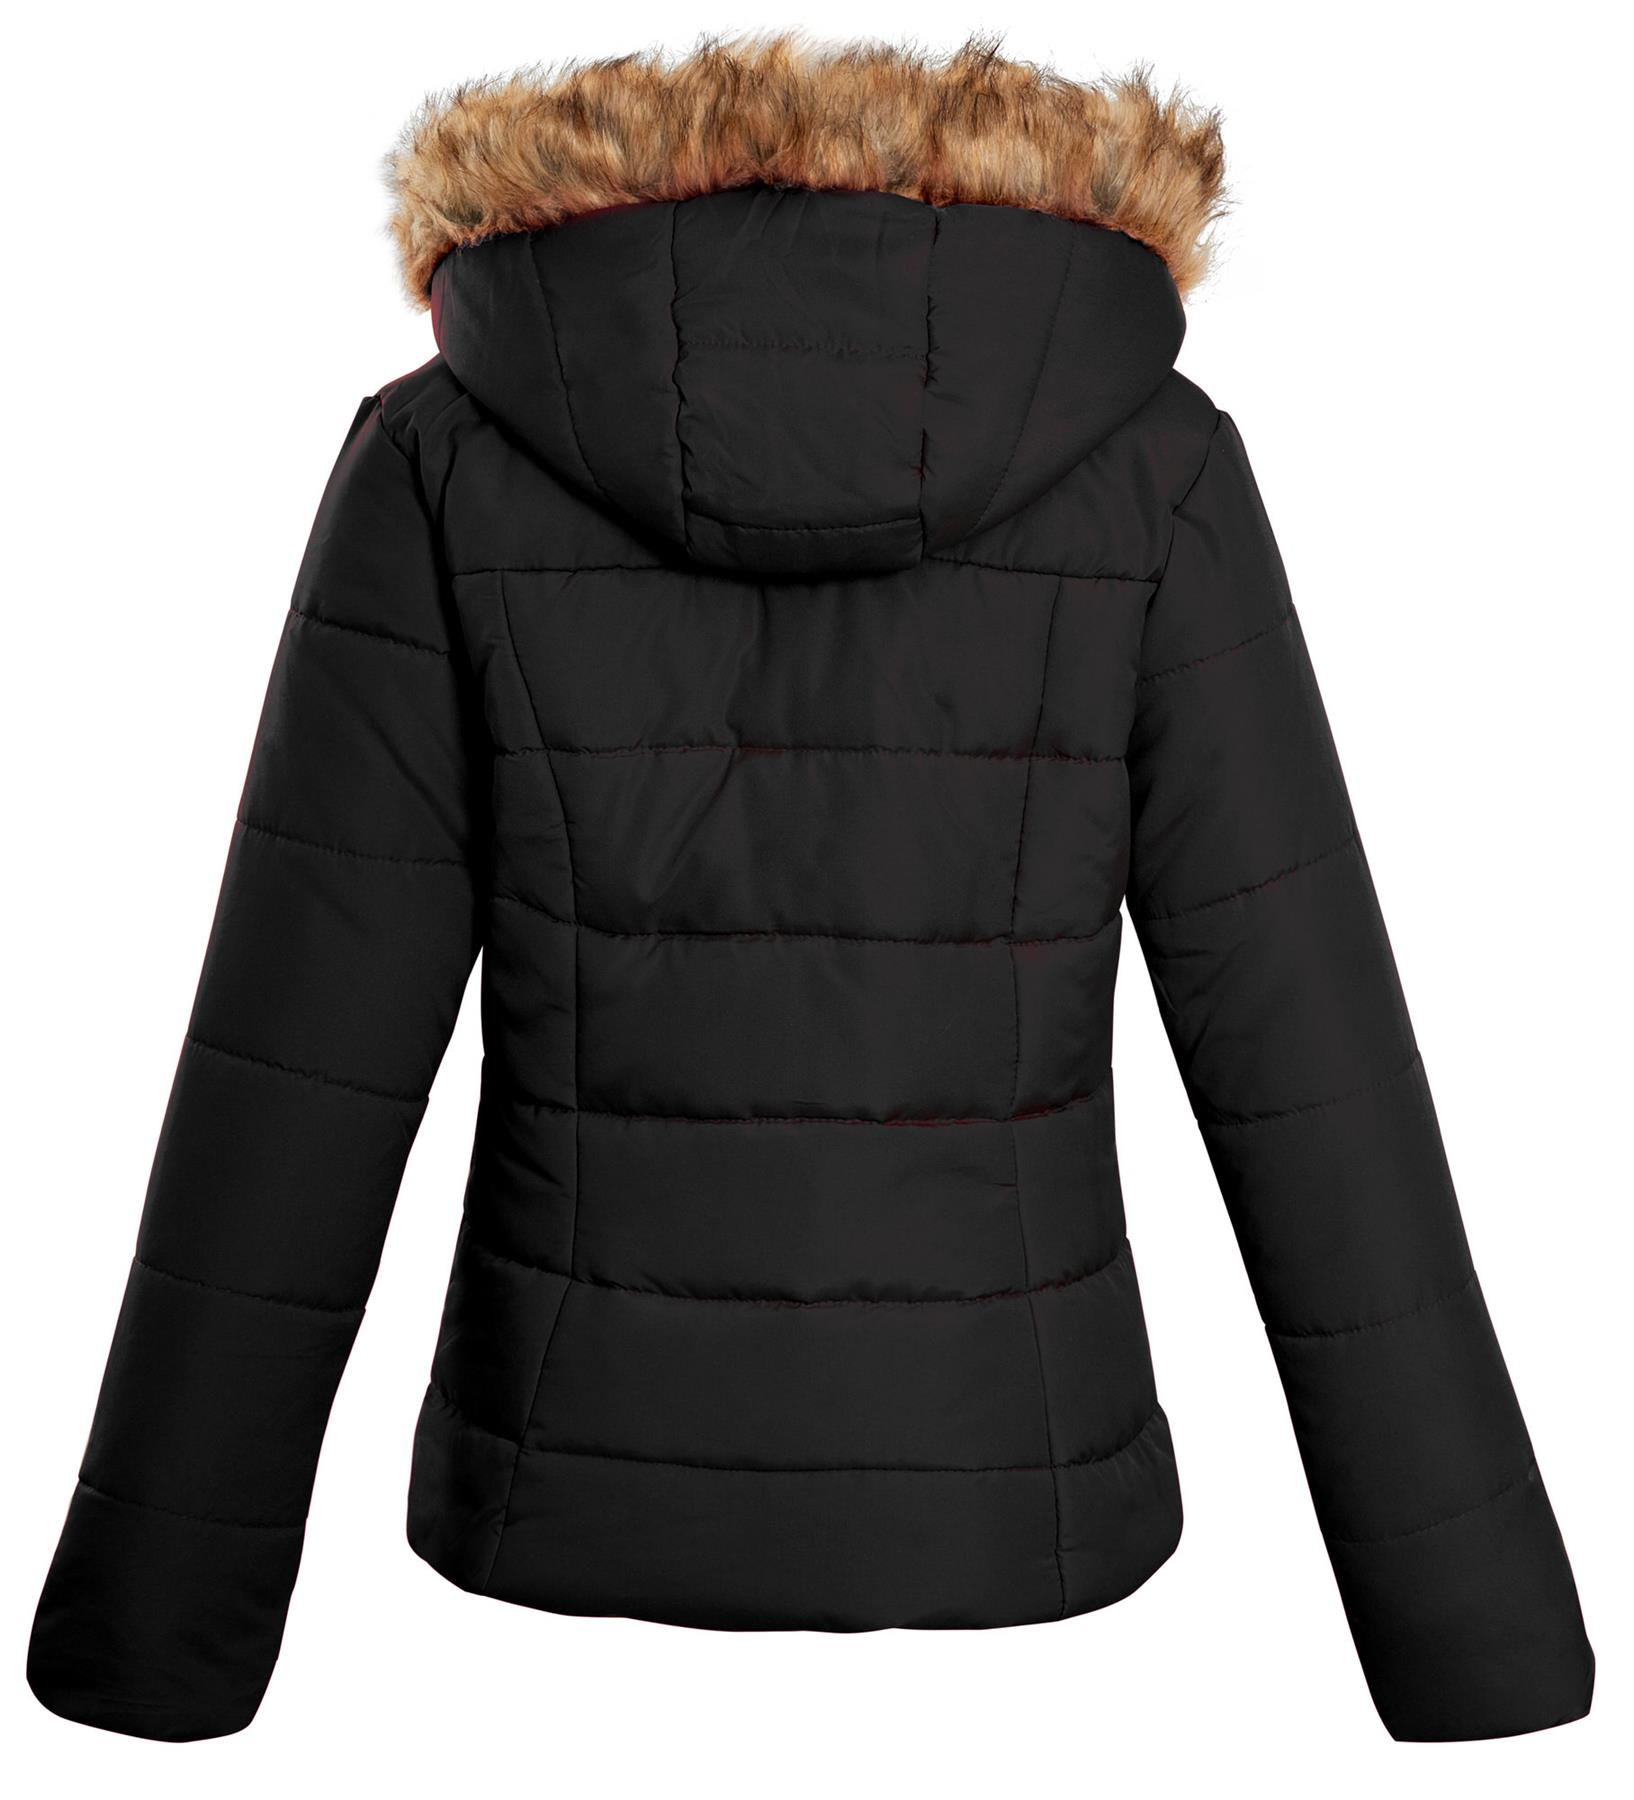 Shelikes-Ladies-Padded-Faux-Fur-Trim-Hood-Hooded-Jacket-Winter-Coat-Size-6-to-16 miniatuur 4